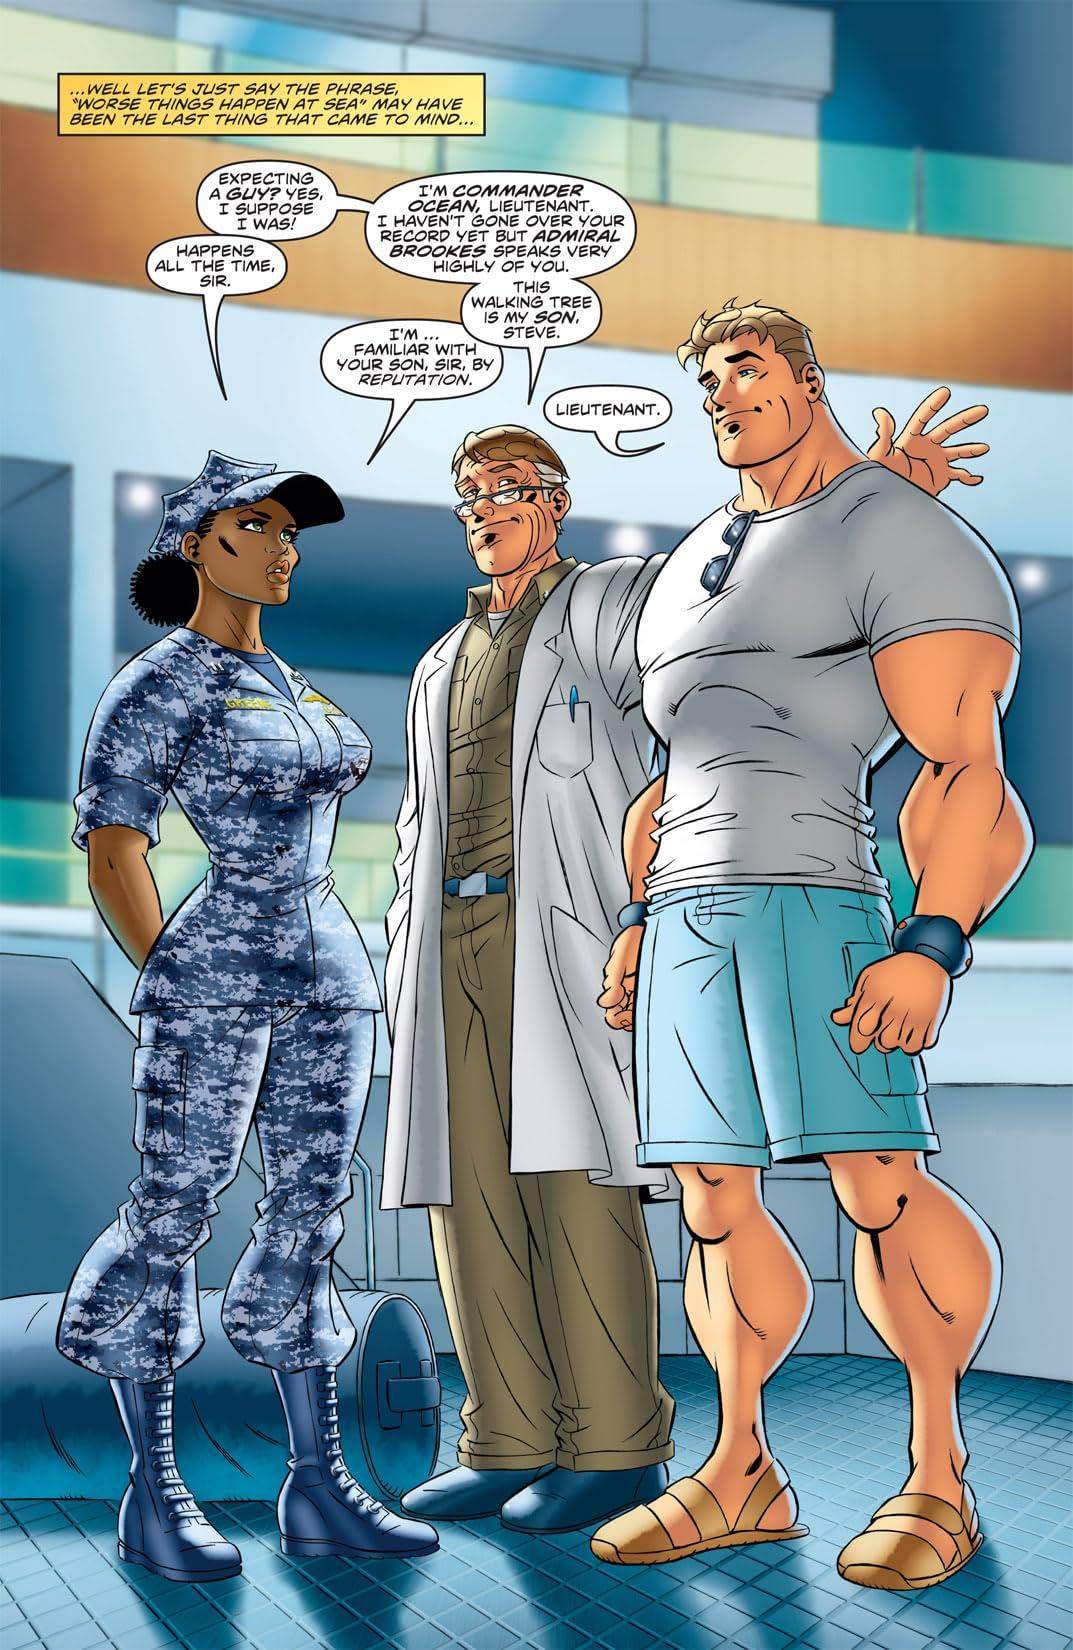 Marineman #2